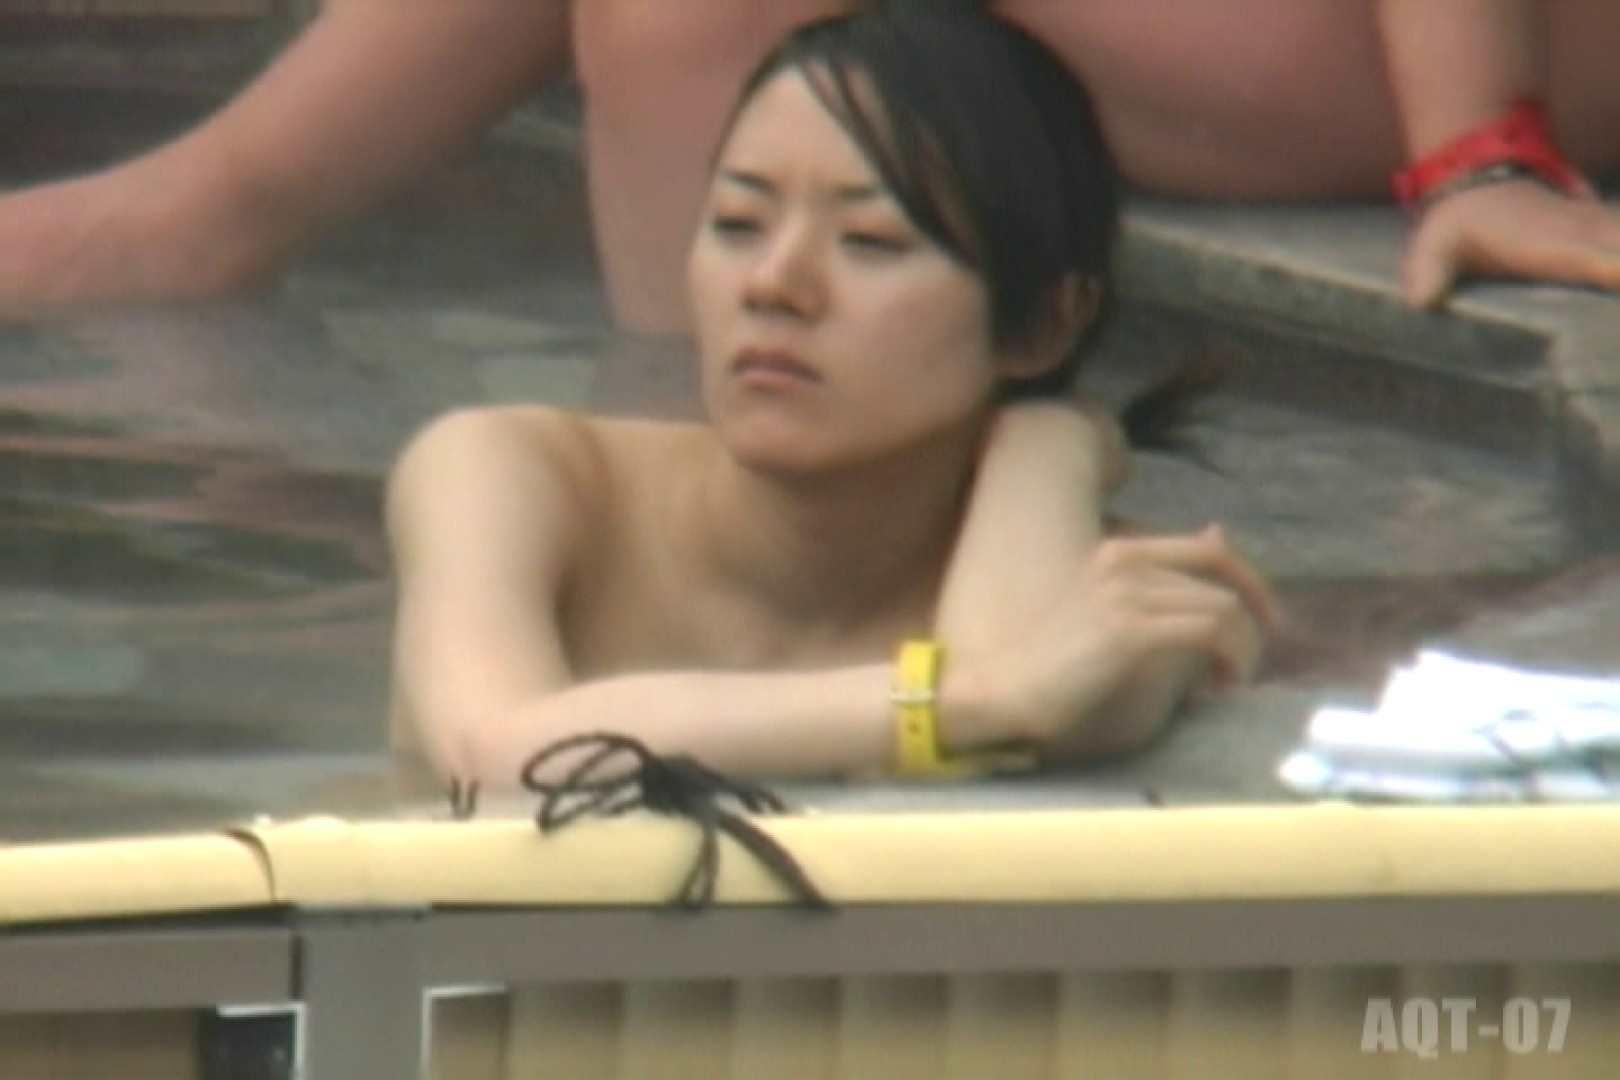 Aquaな露天風呂Vol.765 OLセックス 覗きおまんこ画像 77画像 23